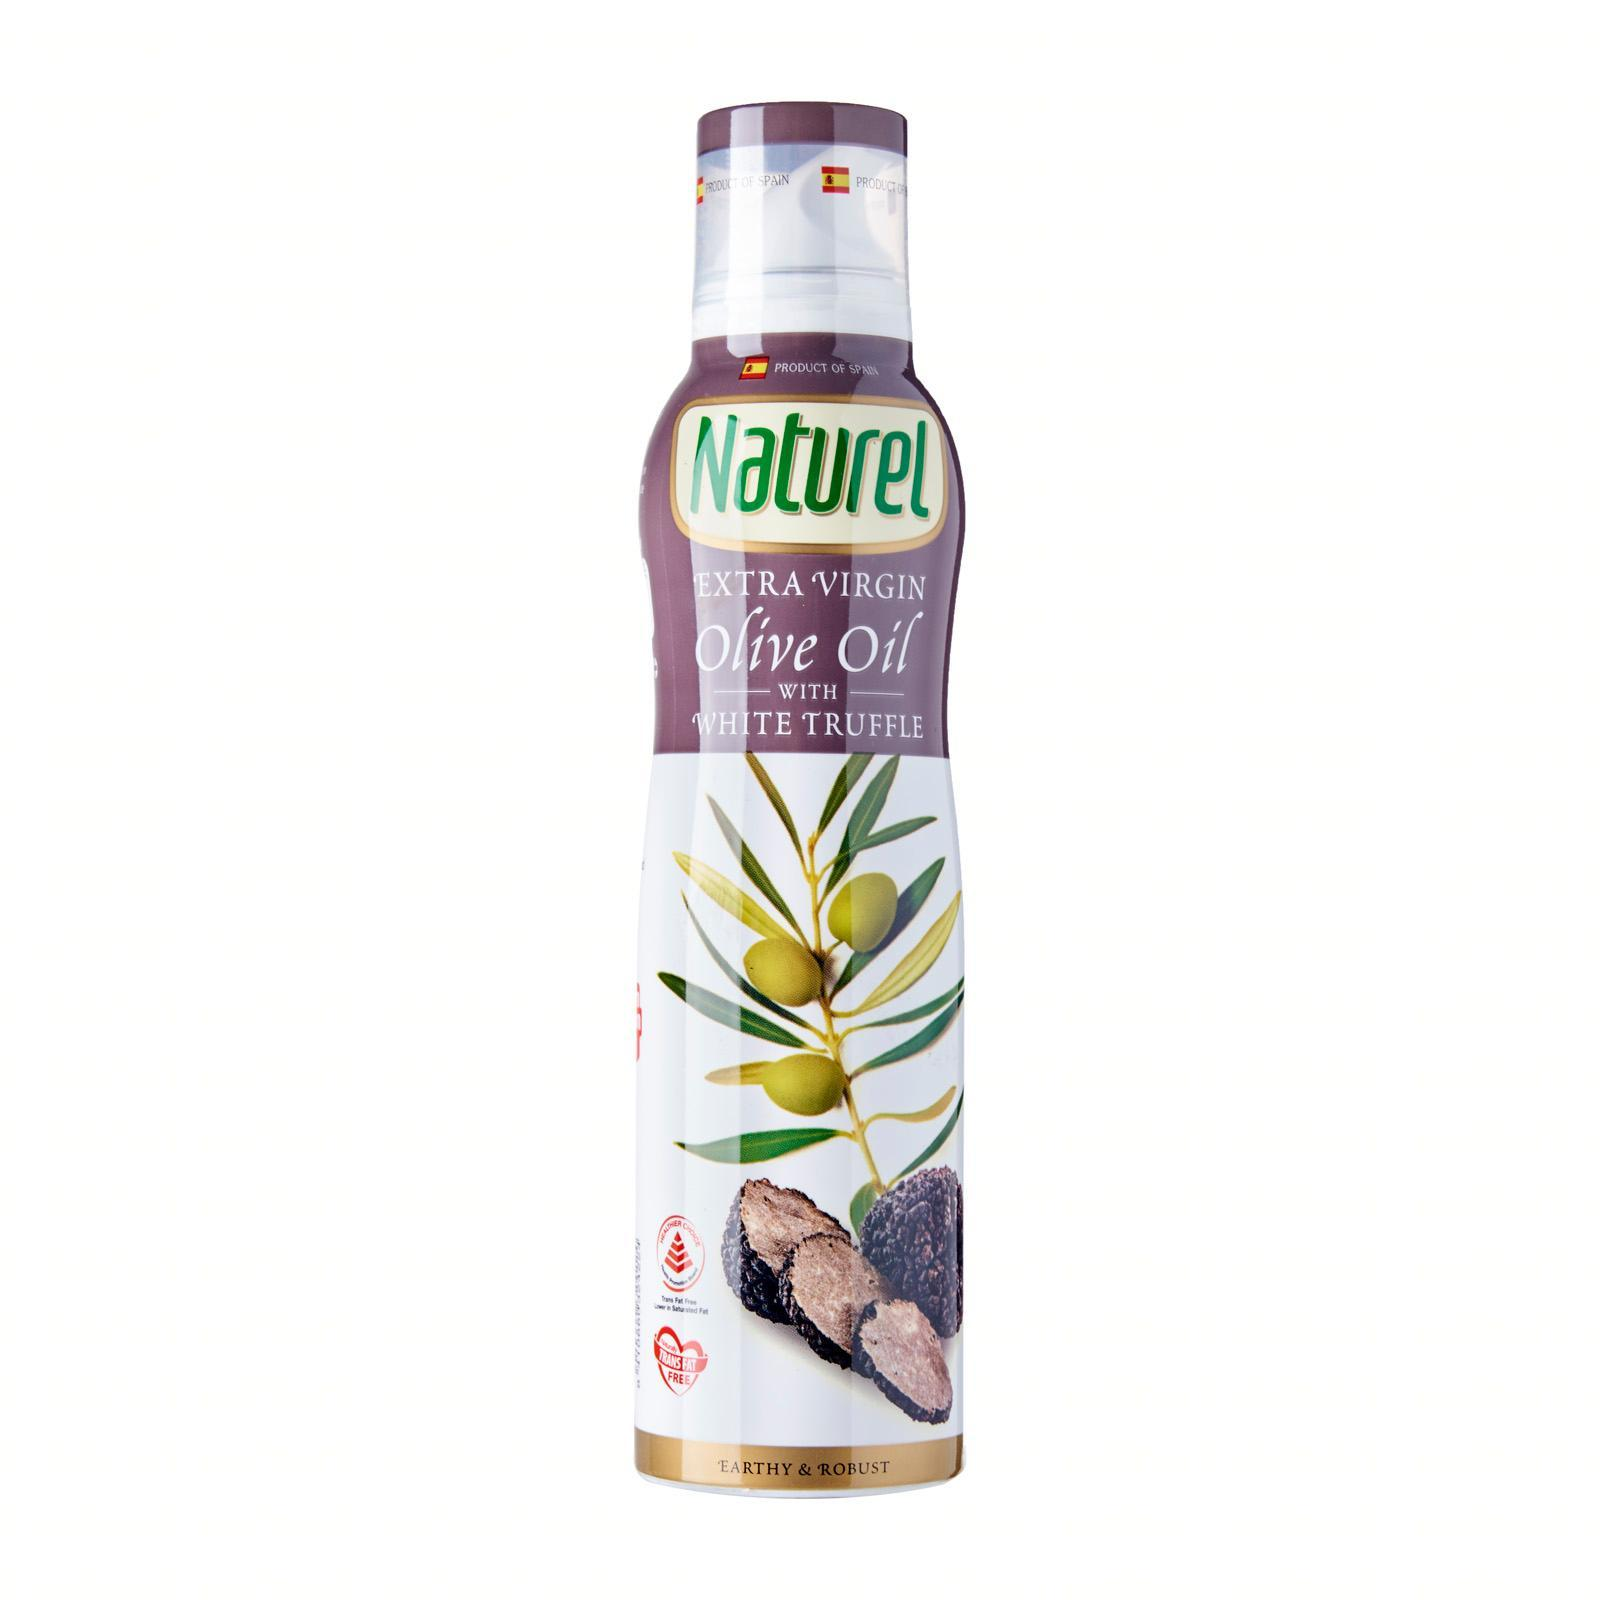 Naturel Extra Virgin Olive Spray - White Truffle Flavoured By Redmart.